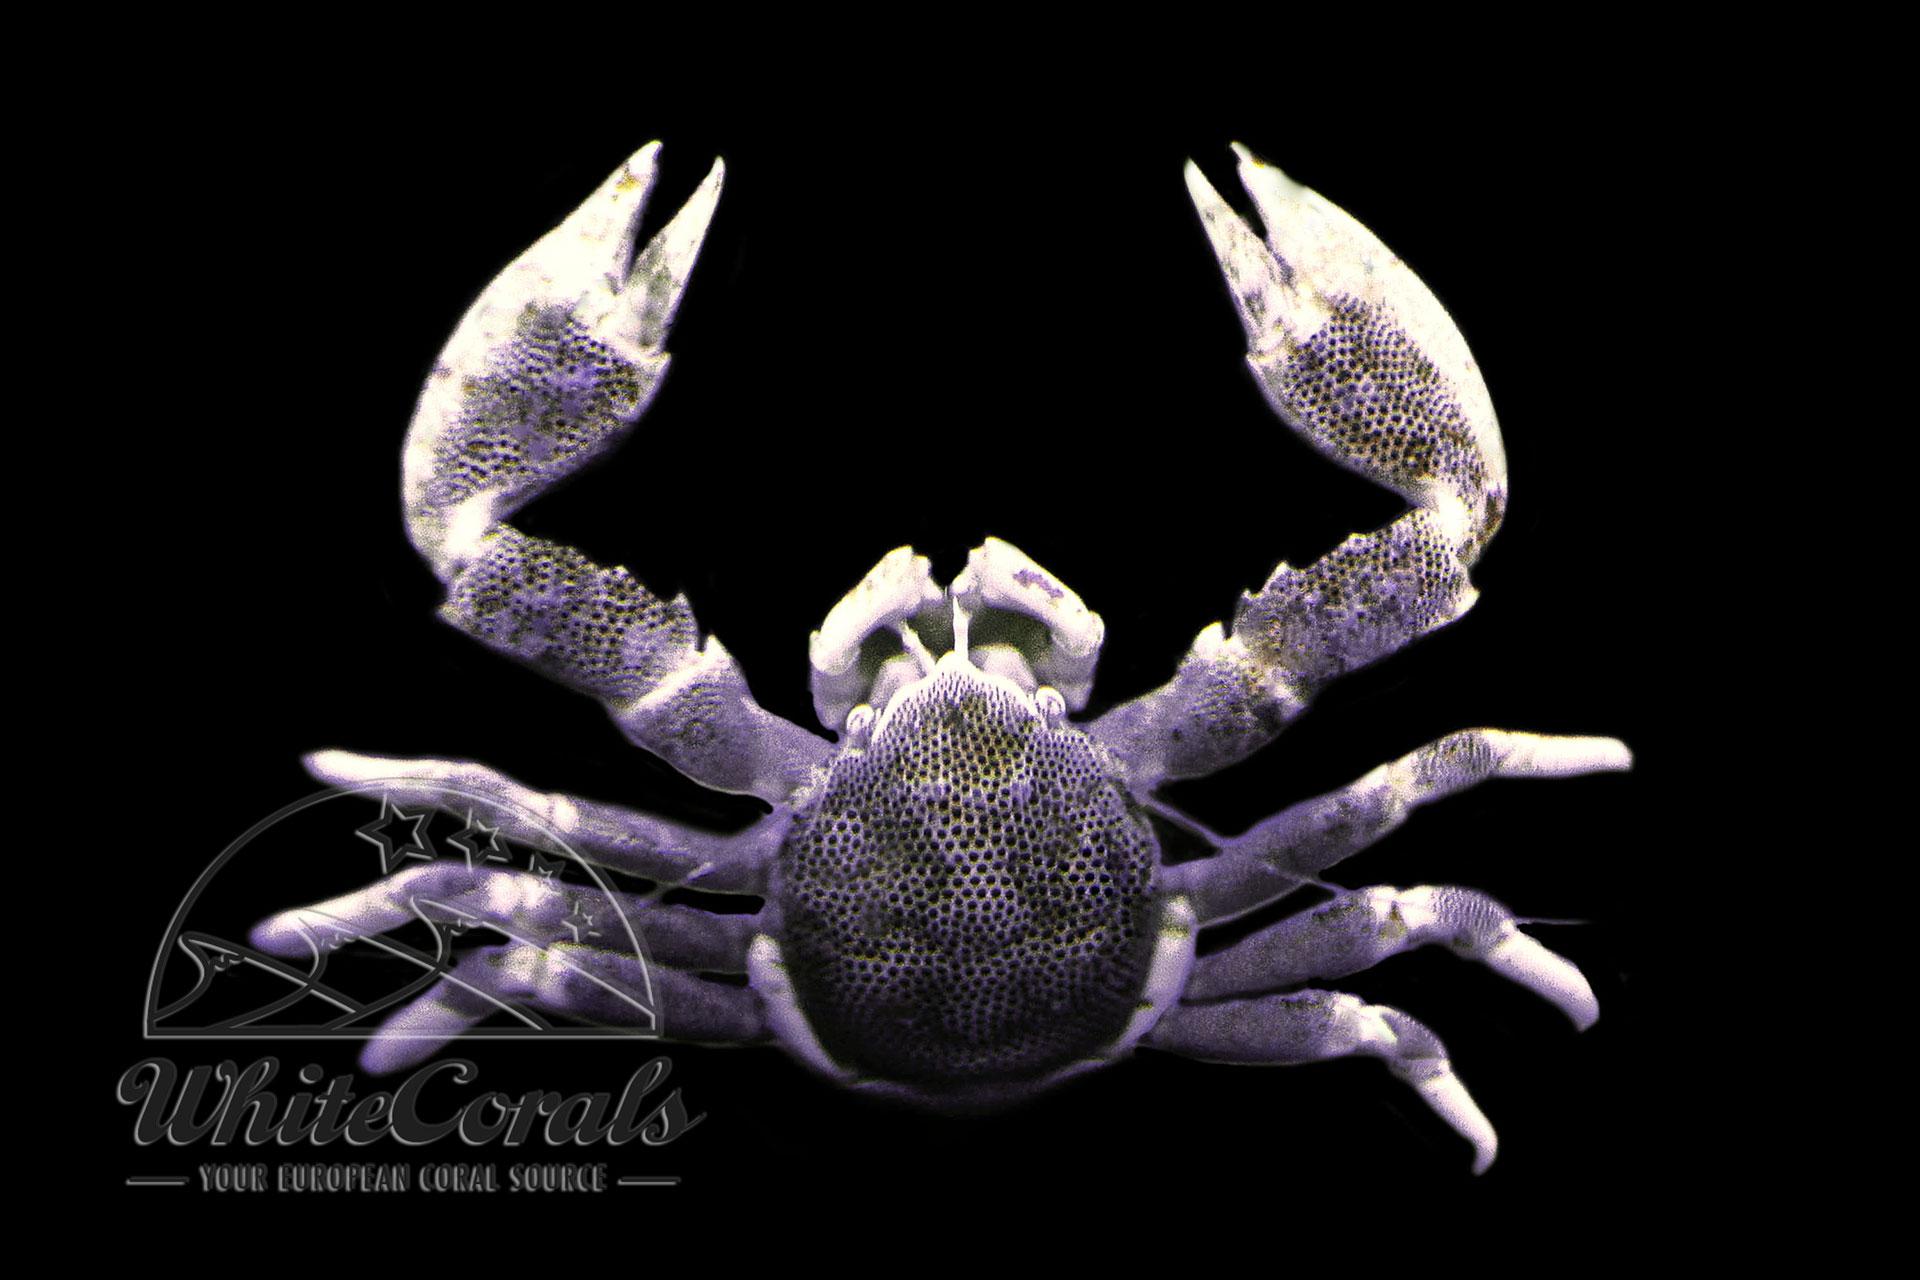 Neopetrolisthes maculatus - Anemone Crab